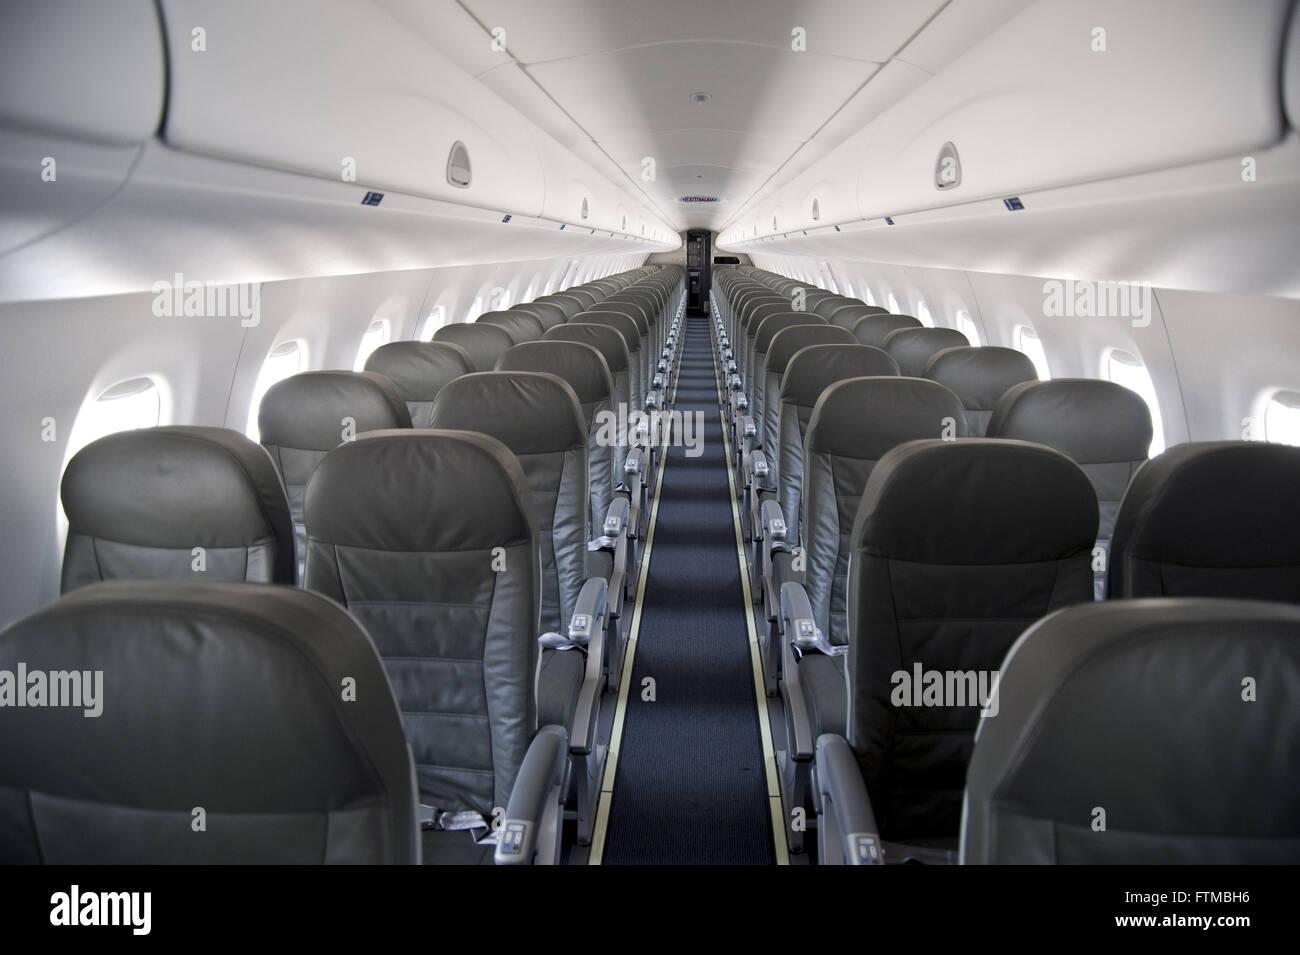 Interior Aircraft Model Emb 195 Embraer Stock Photo